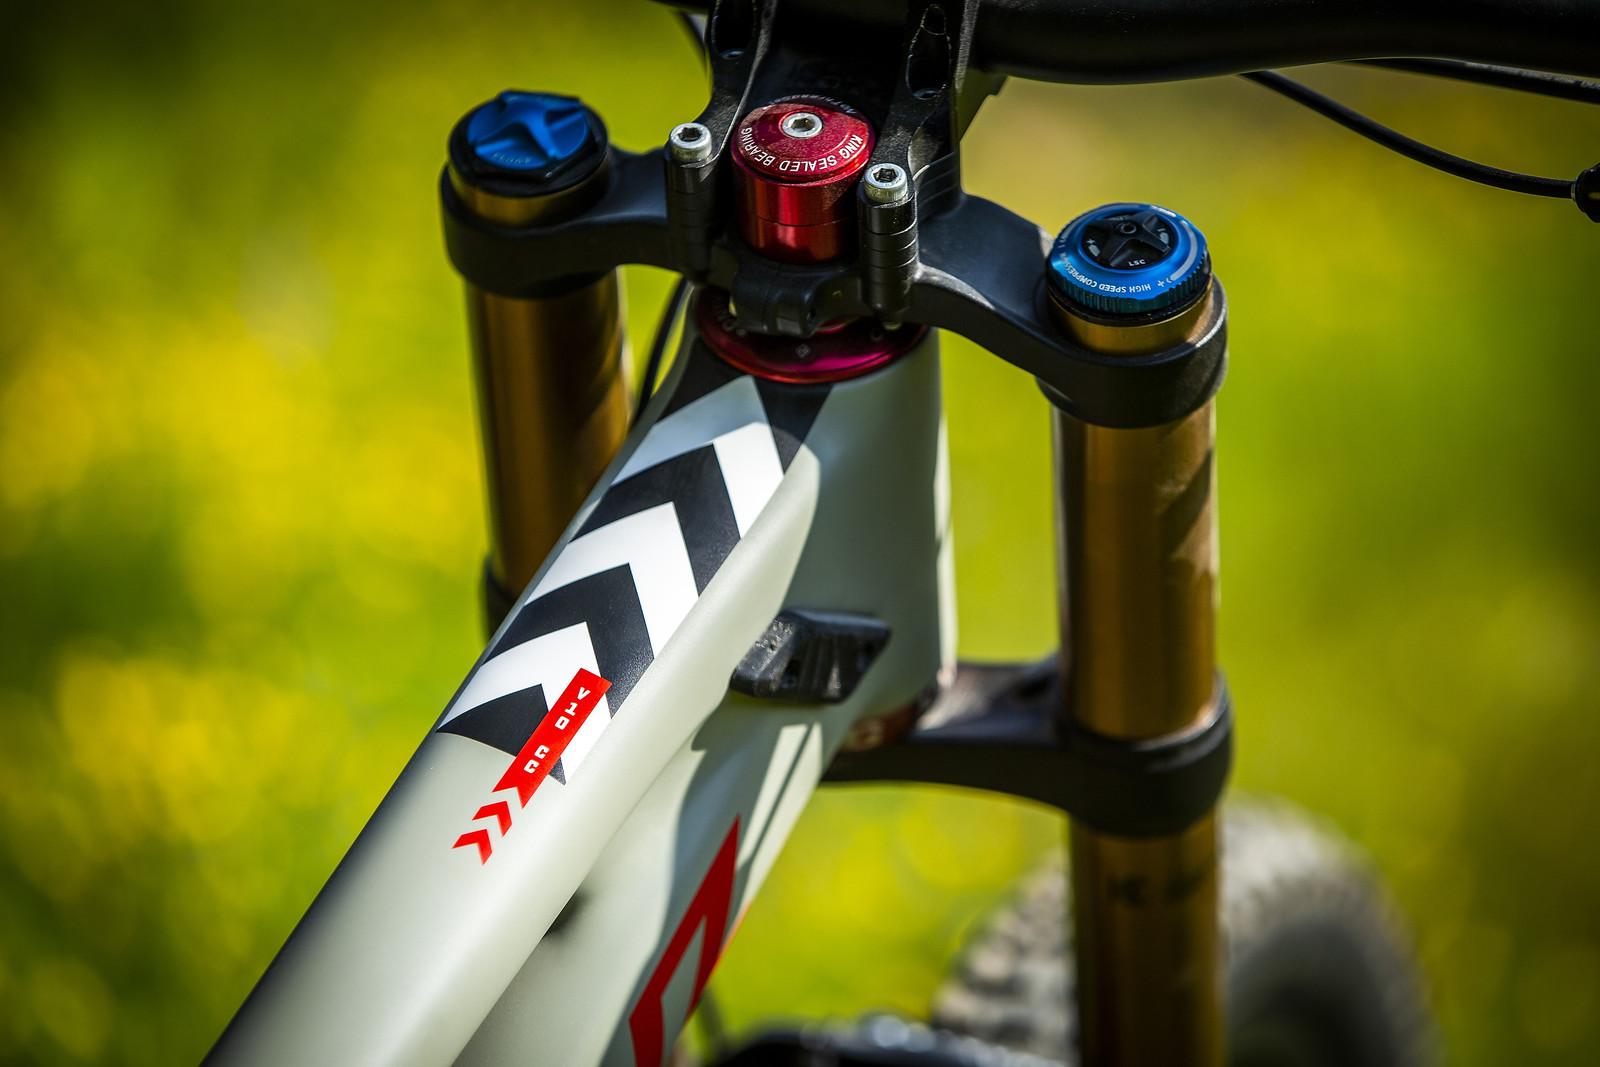 Greg Minnaar's New Santa Cruz V10 29er - Greg Minnaar's New Santa Cruz V10 29er - Mountain Biking Pictures - Vital MTB